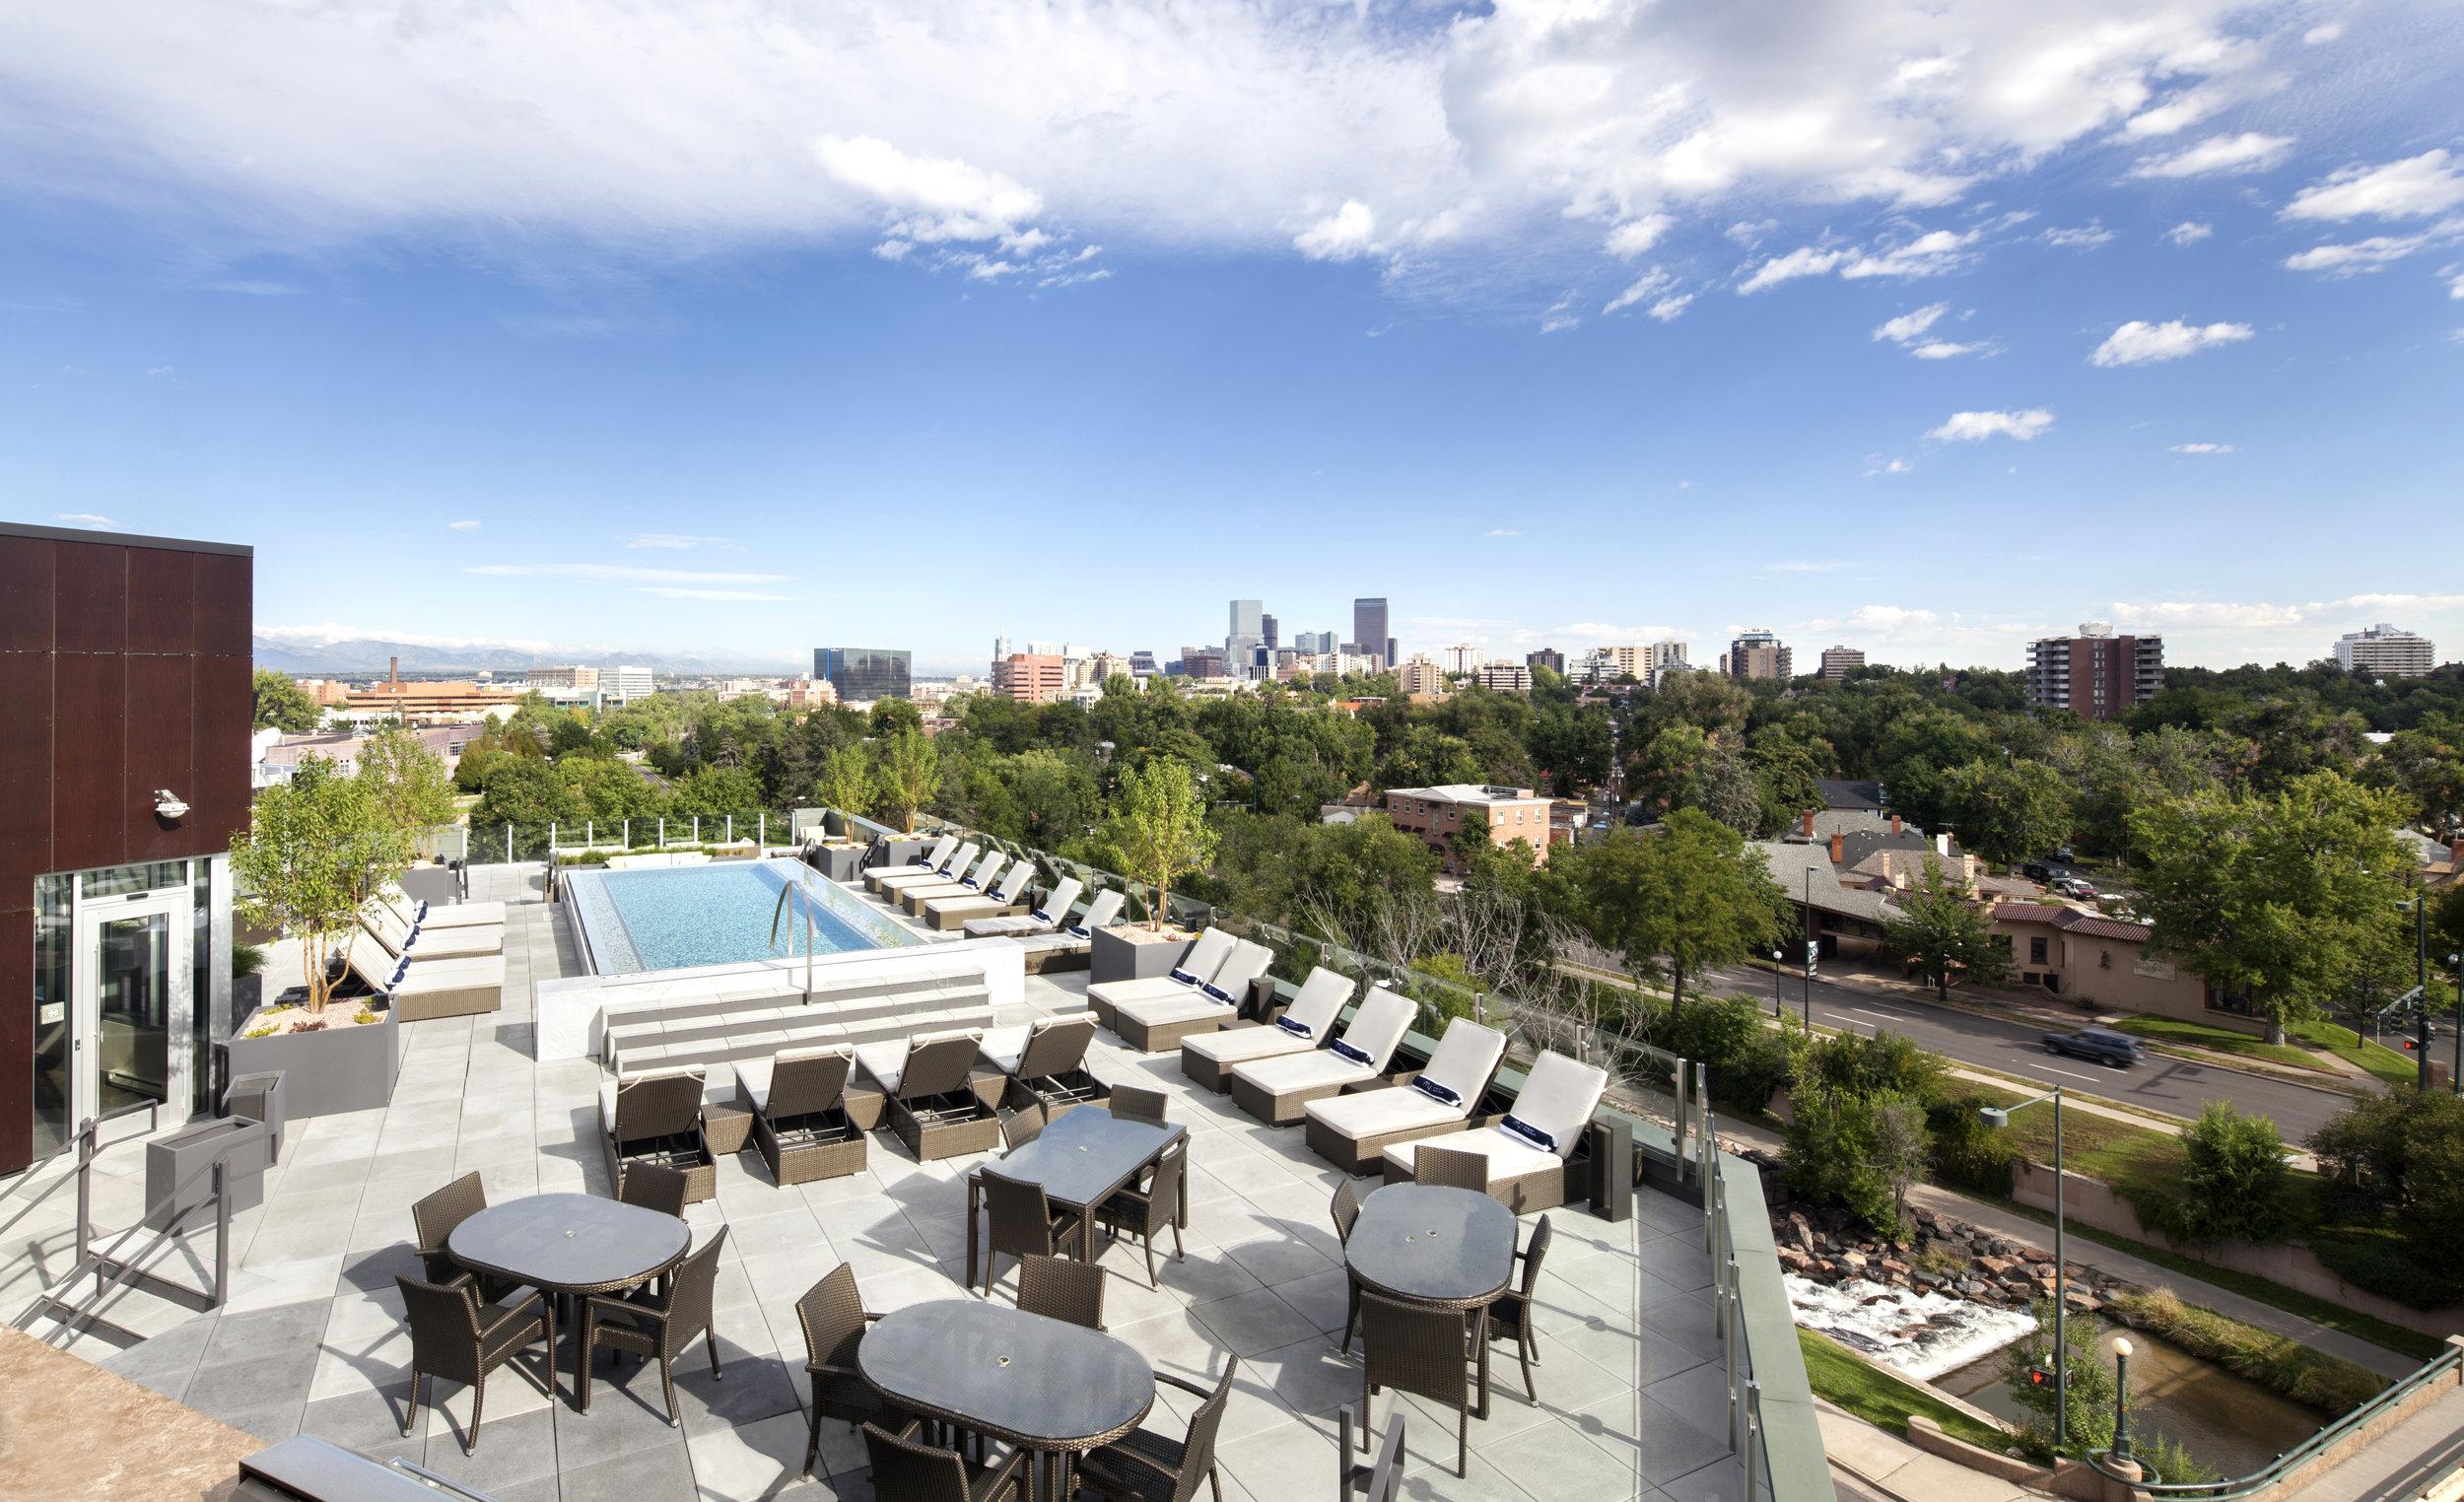 <f>Services</f><f>LandscapeArchitecture</f></f><f>Markets</f><f>Residential</f><t>My Block Wash Park</t><m>Denver, CO</m>